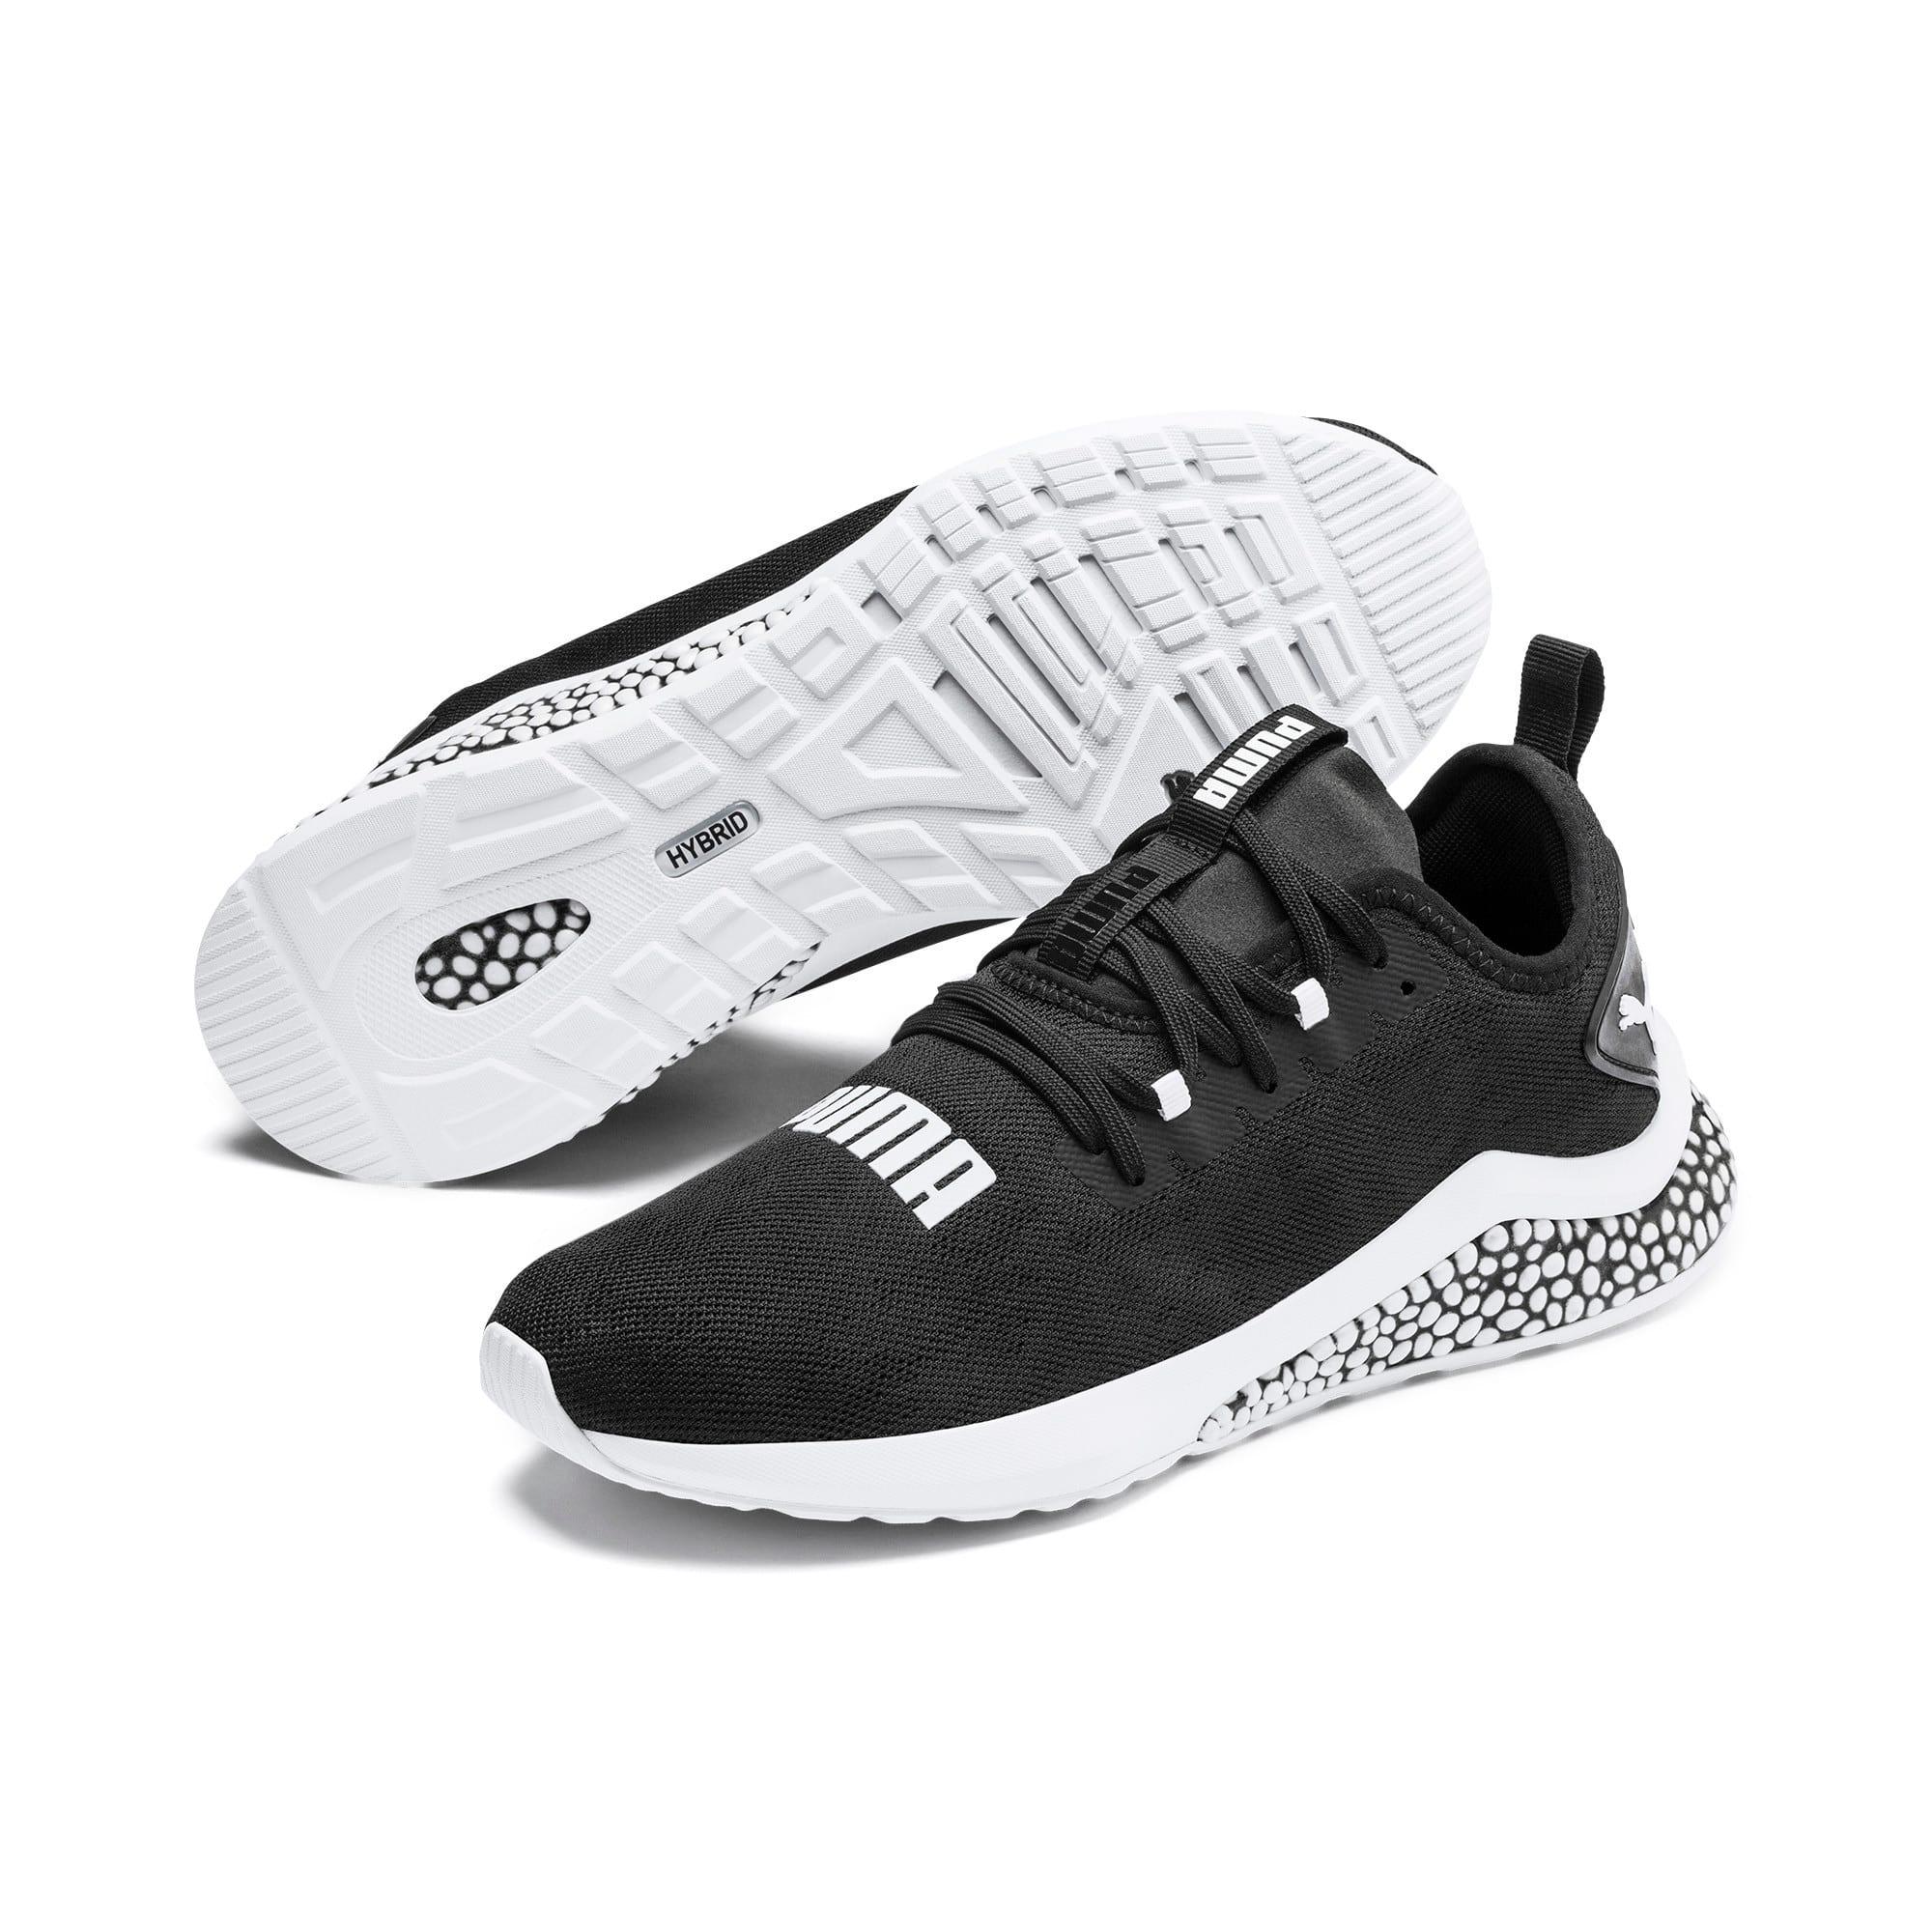 Thumbnail 2 of HYBRID NX Camo Men's Running Shoes, Puma Black-Puma White, medium